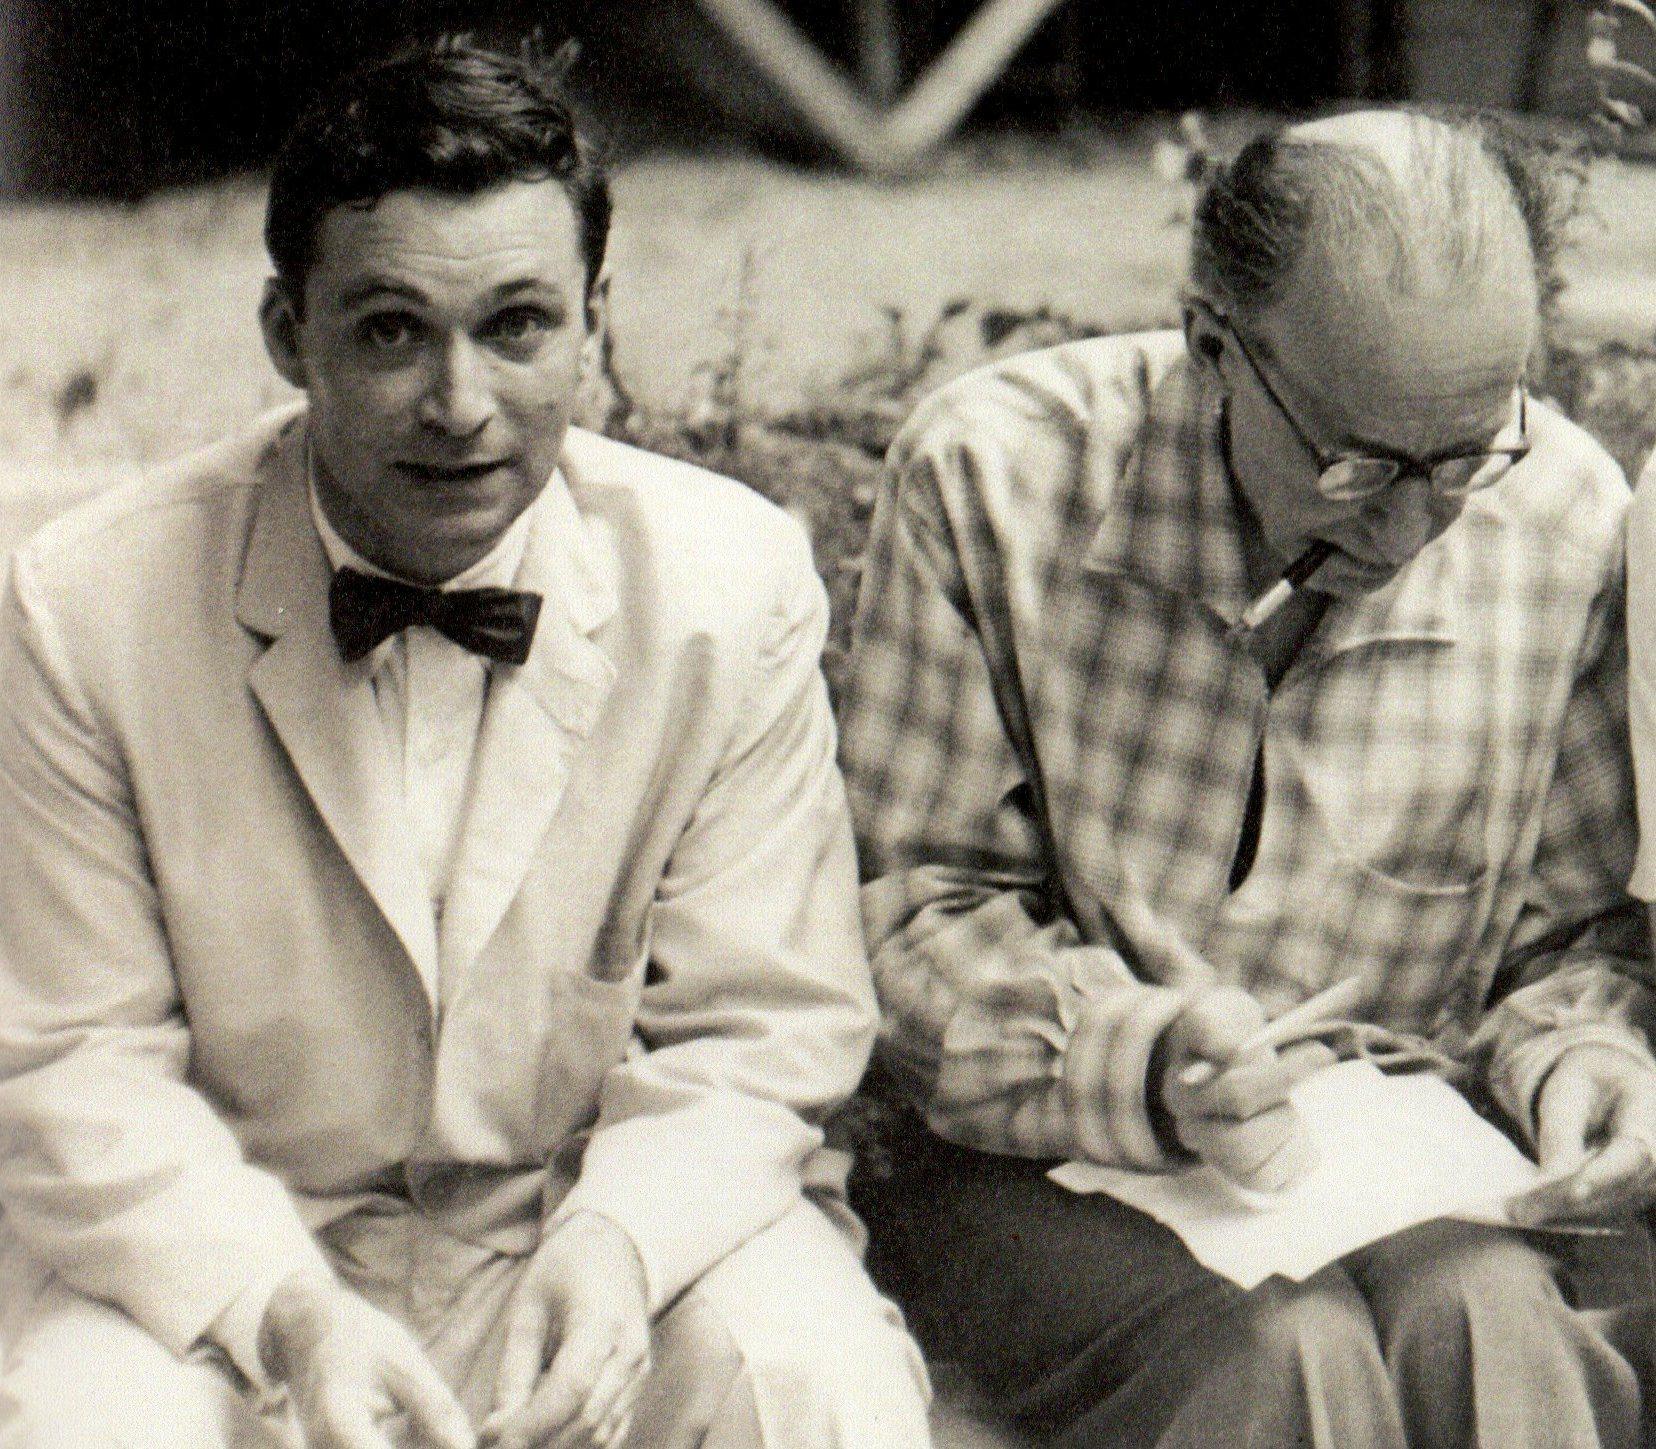 Rewald (left) and Marchutz